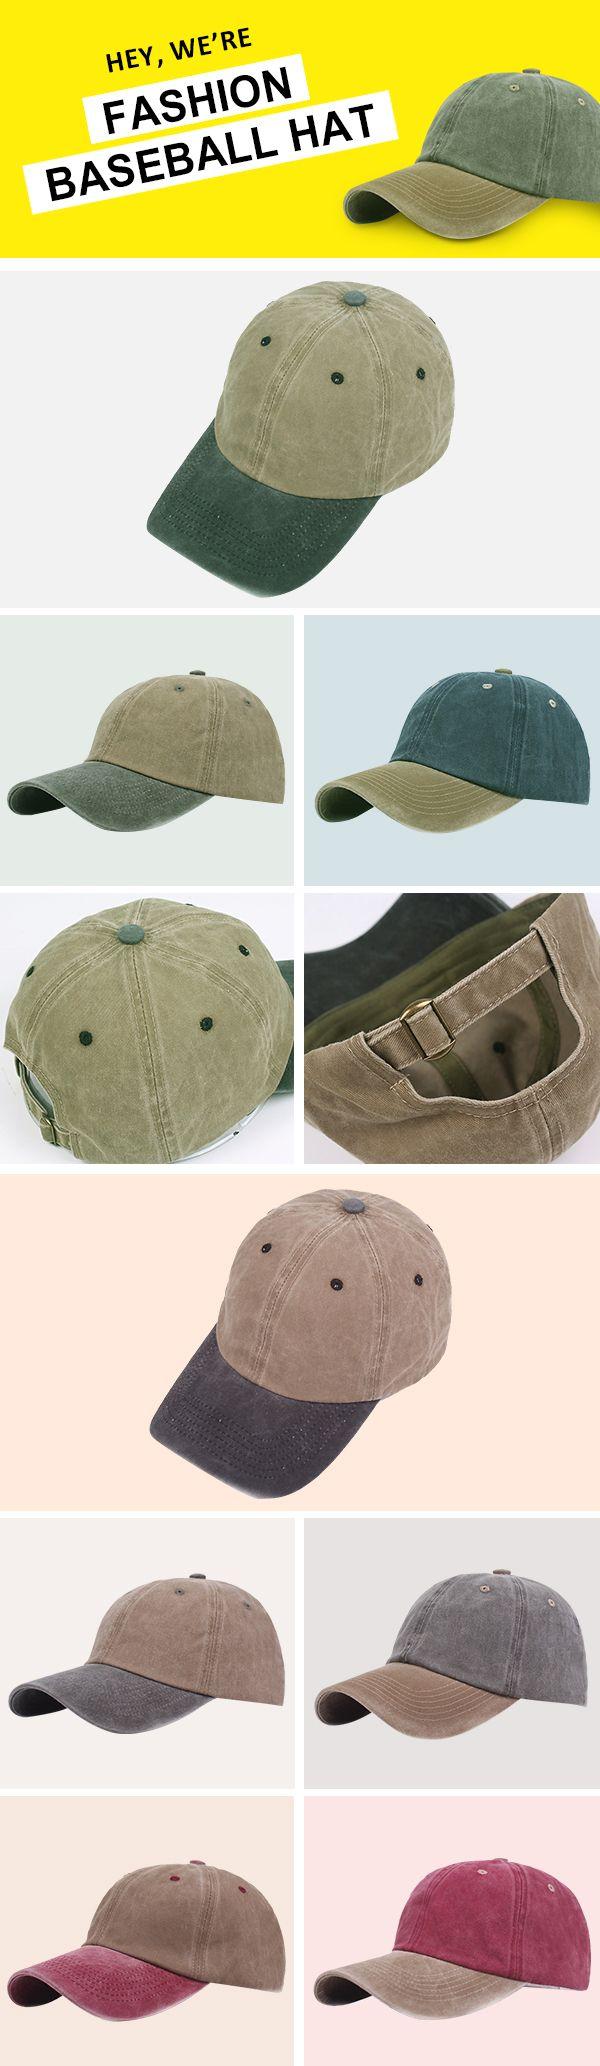 US$7.99+Free shipping. Men\'s Cap, Men\'s Fashion, Beret Hat, Golf Hat ...